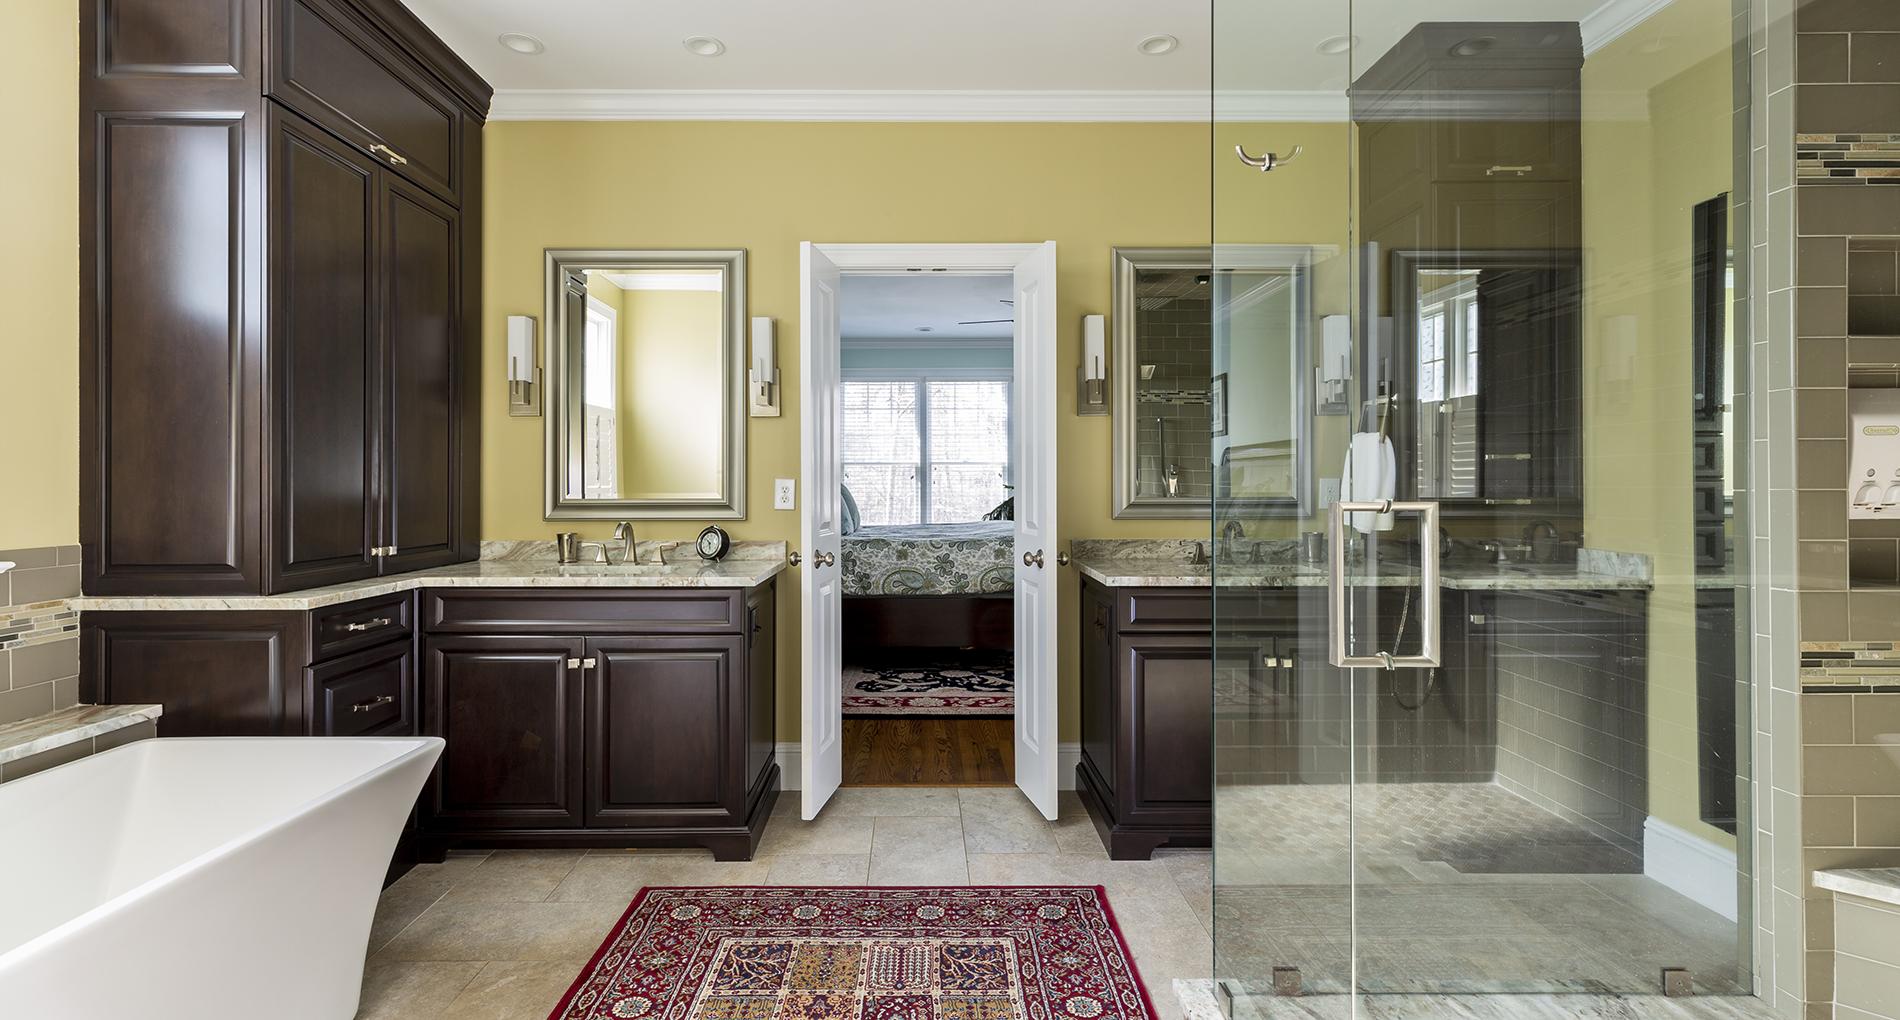 Stough Master Bathroom Remodel